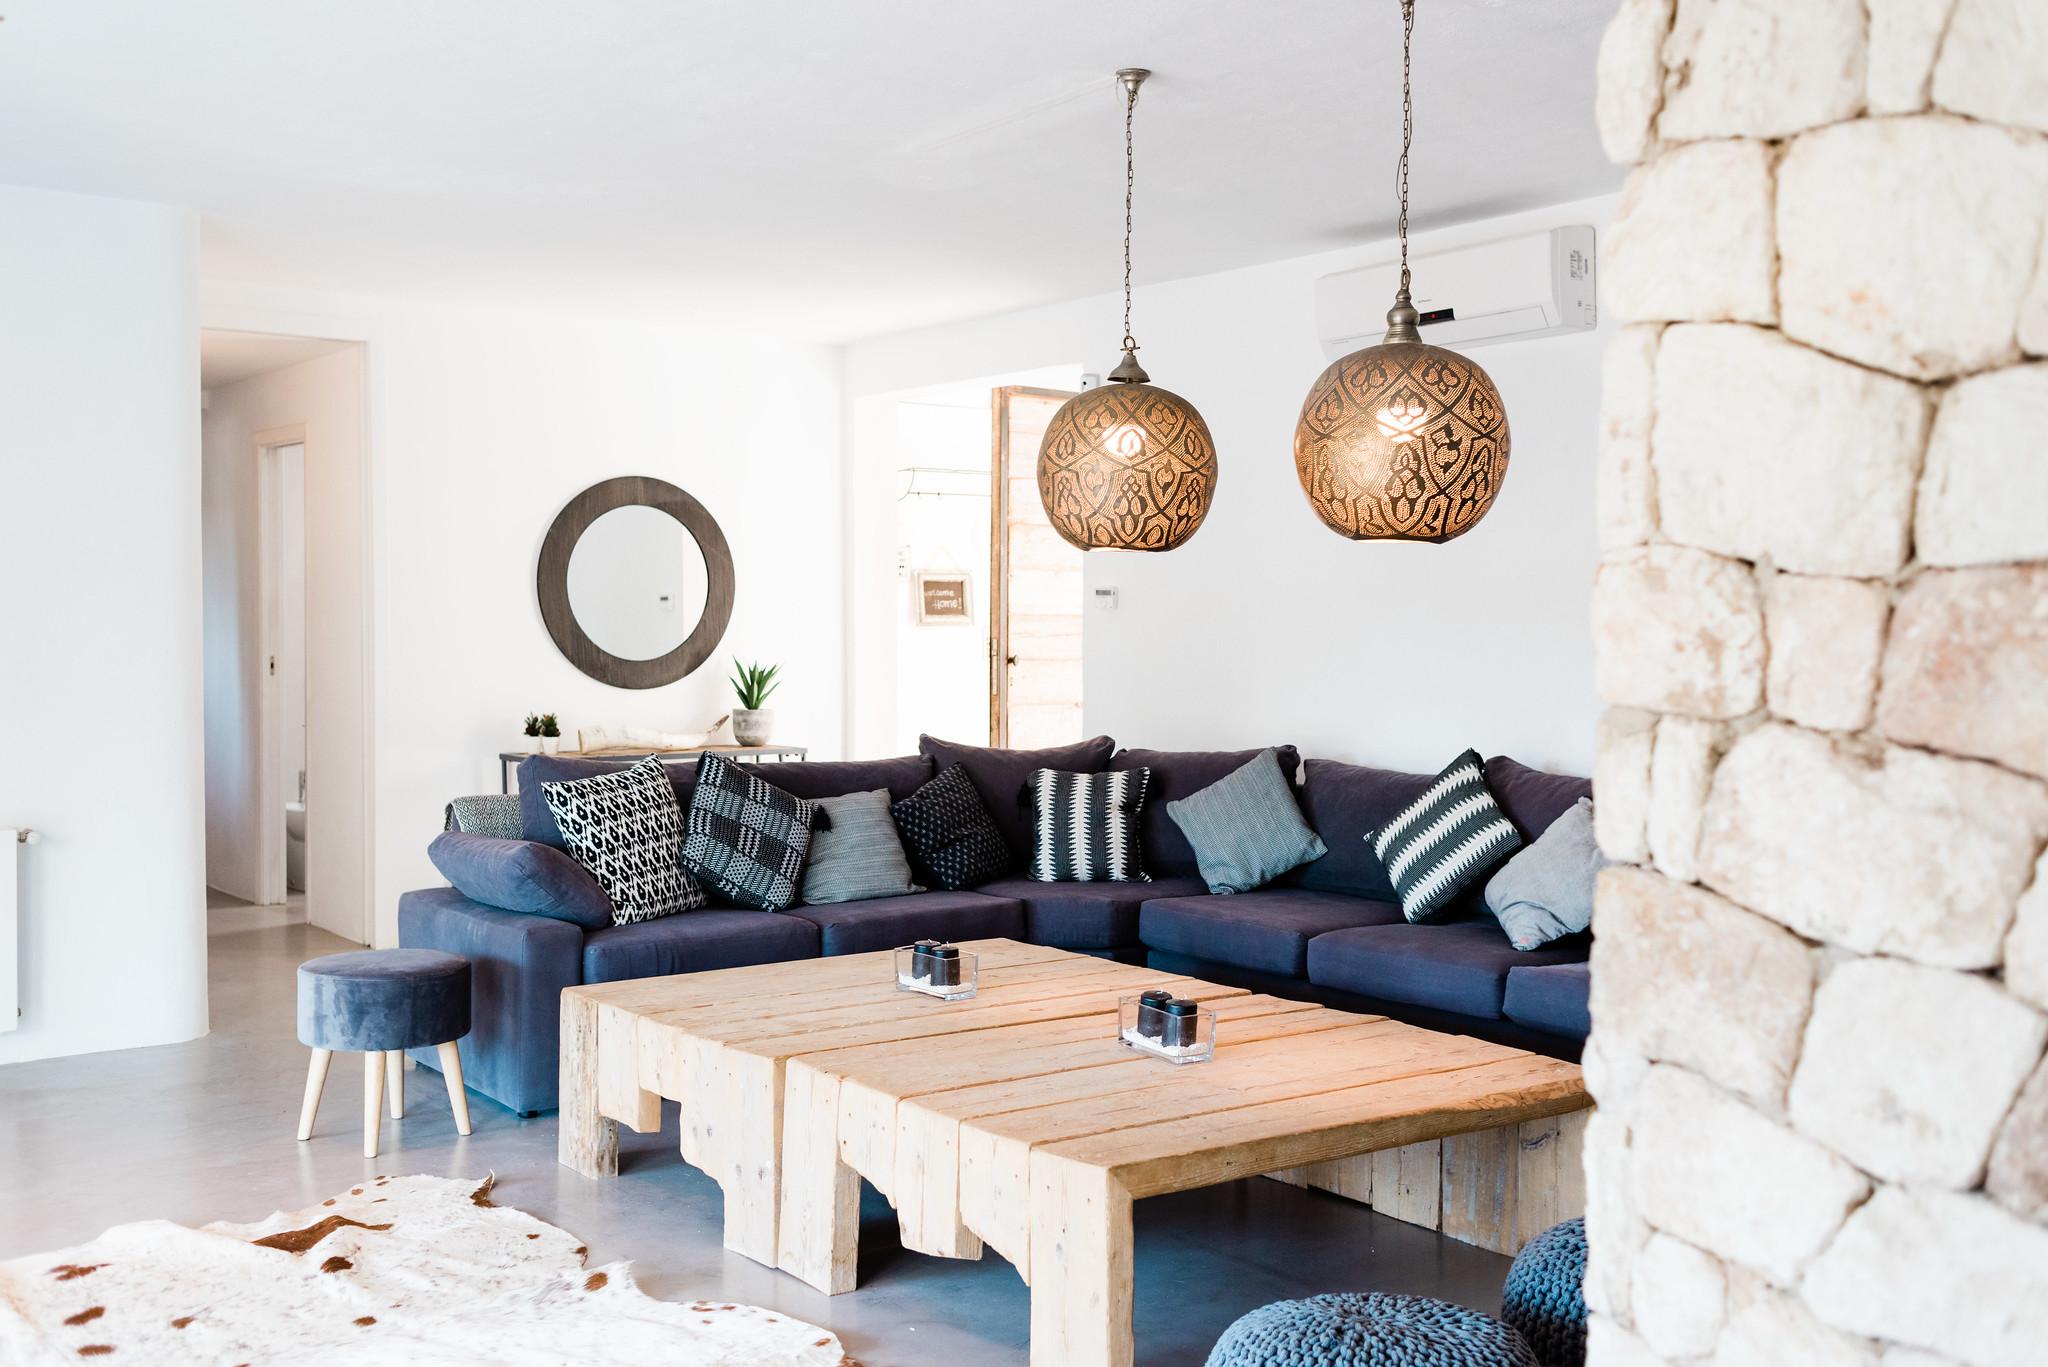 https://www.white-ibiza.com/wp-content/uploads/2020/05/white-ibiza-villas-can-verde-interior-living-room.jpg